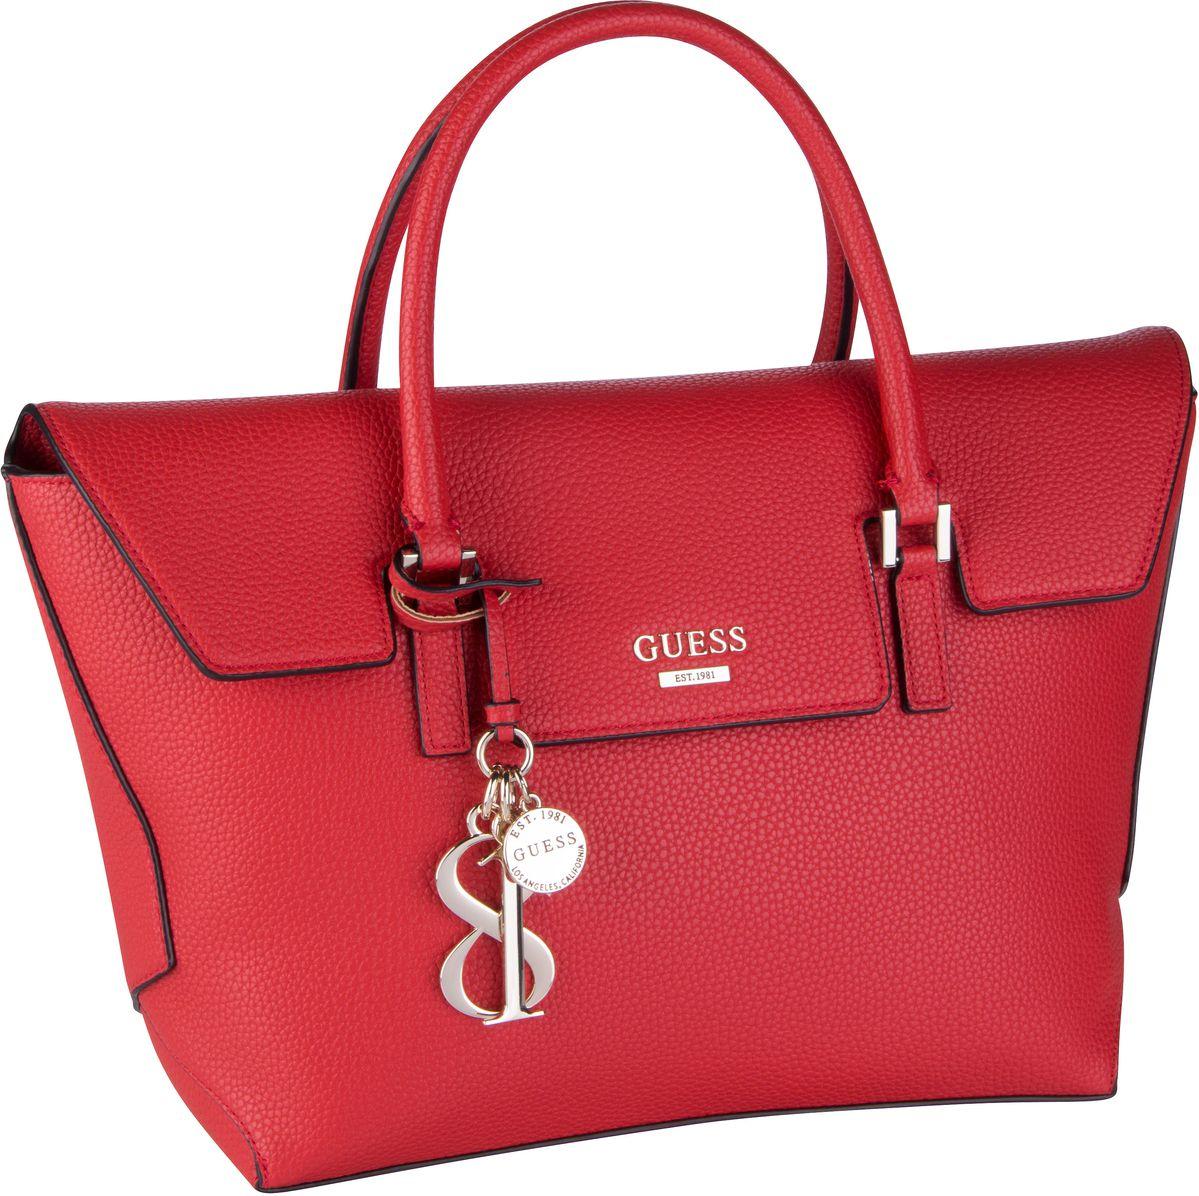 Handtasche West Side Flap Satchel Red